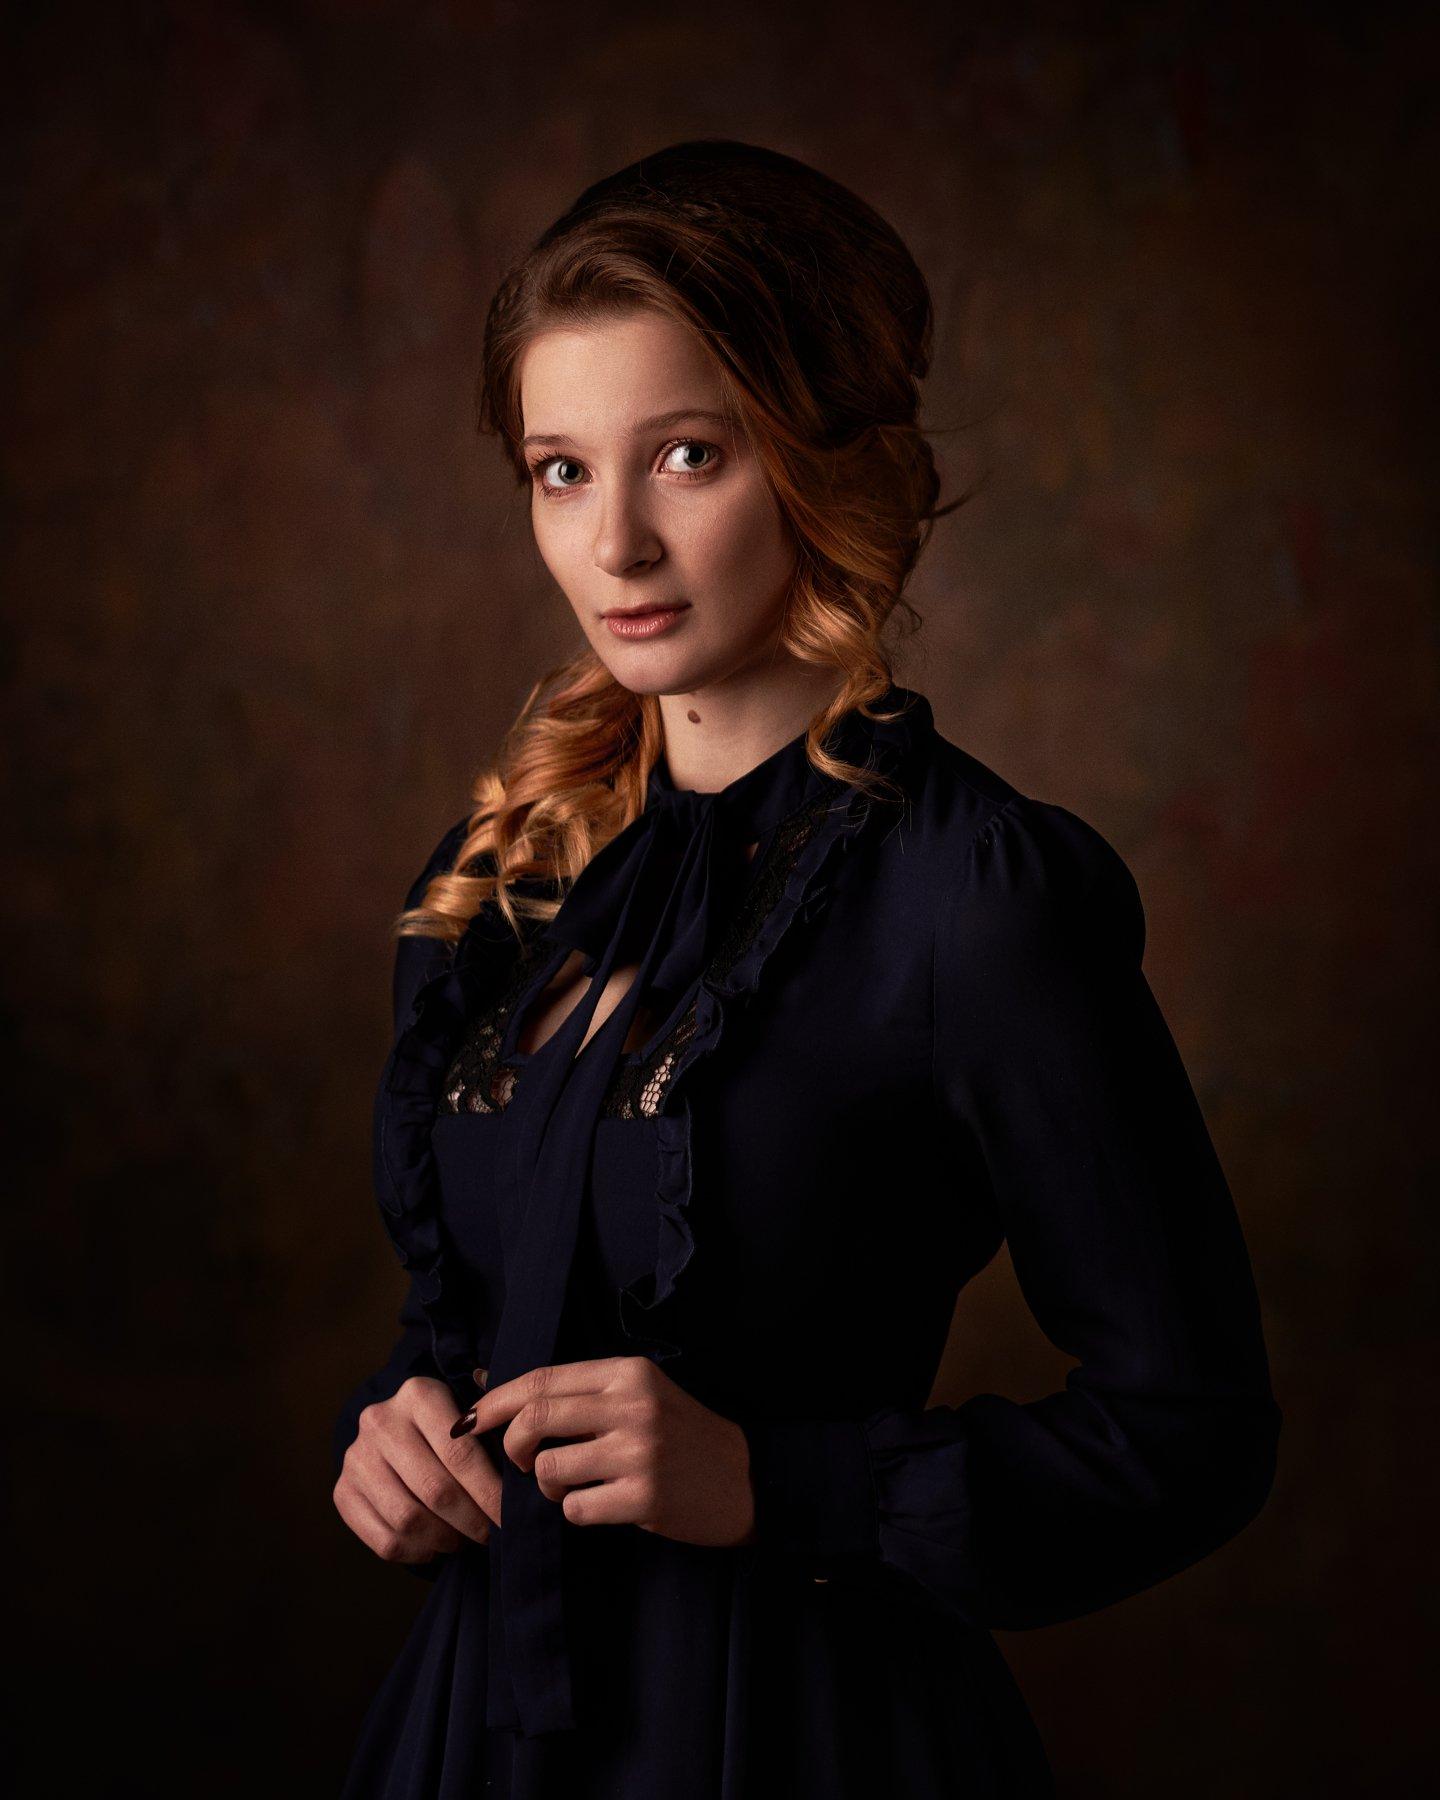 pyzhikphoto, портрет, классика, классический портрет, портрет девушки, женский портрет, portrait, classic, art, красавица, фото, девушка, рыжая, веснушки, Пыжик Максим